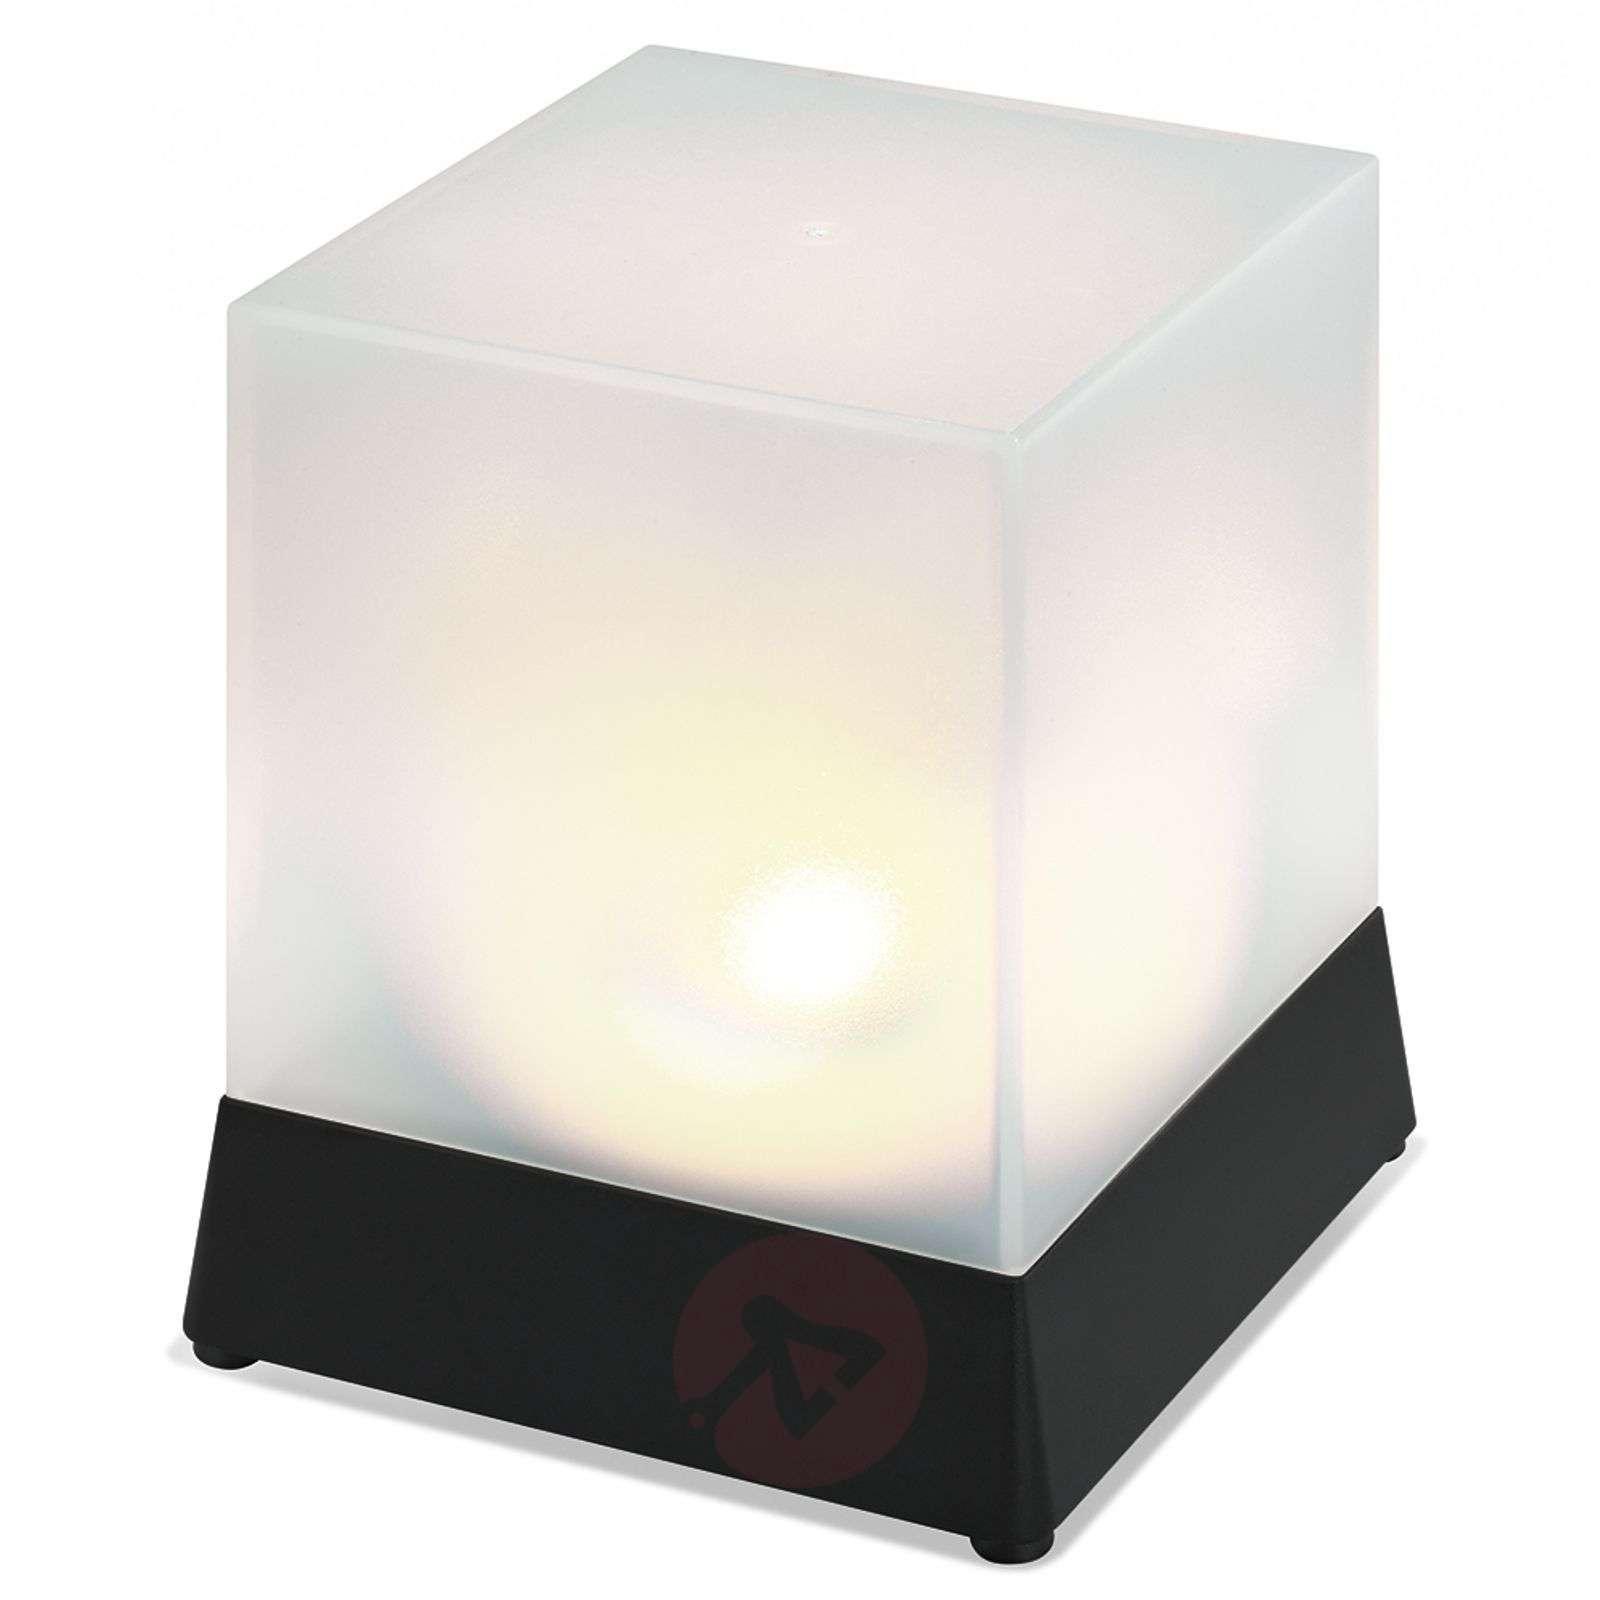 ... Cube Shaped LED Solar Table Lamp Cube 3012236 05 ...